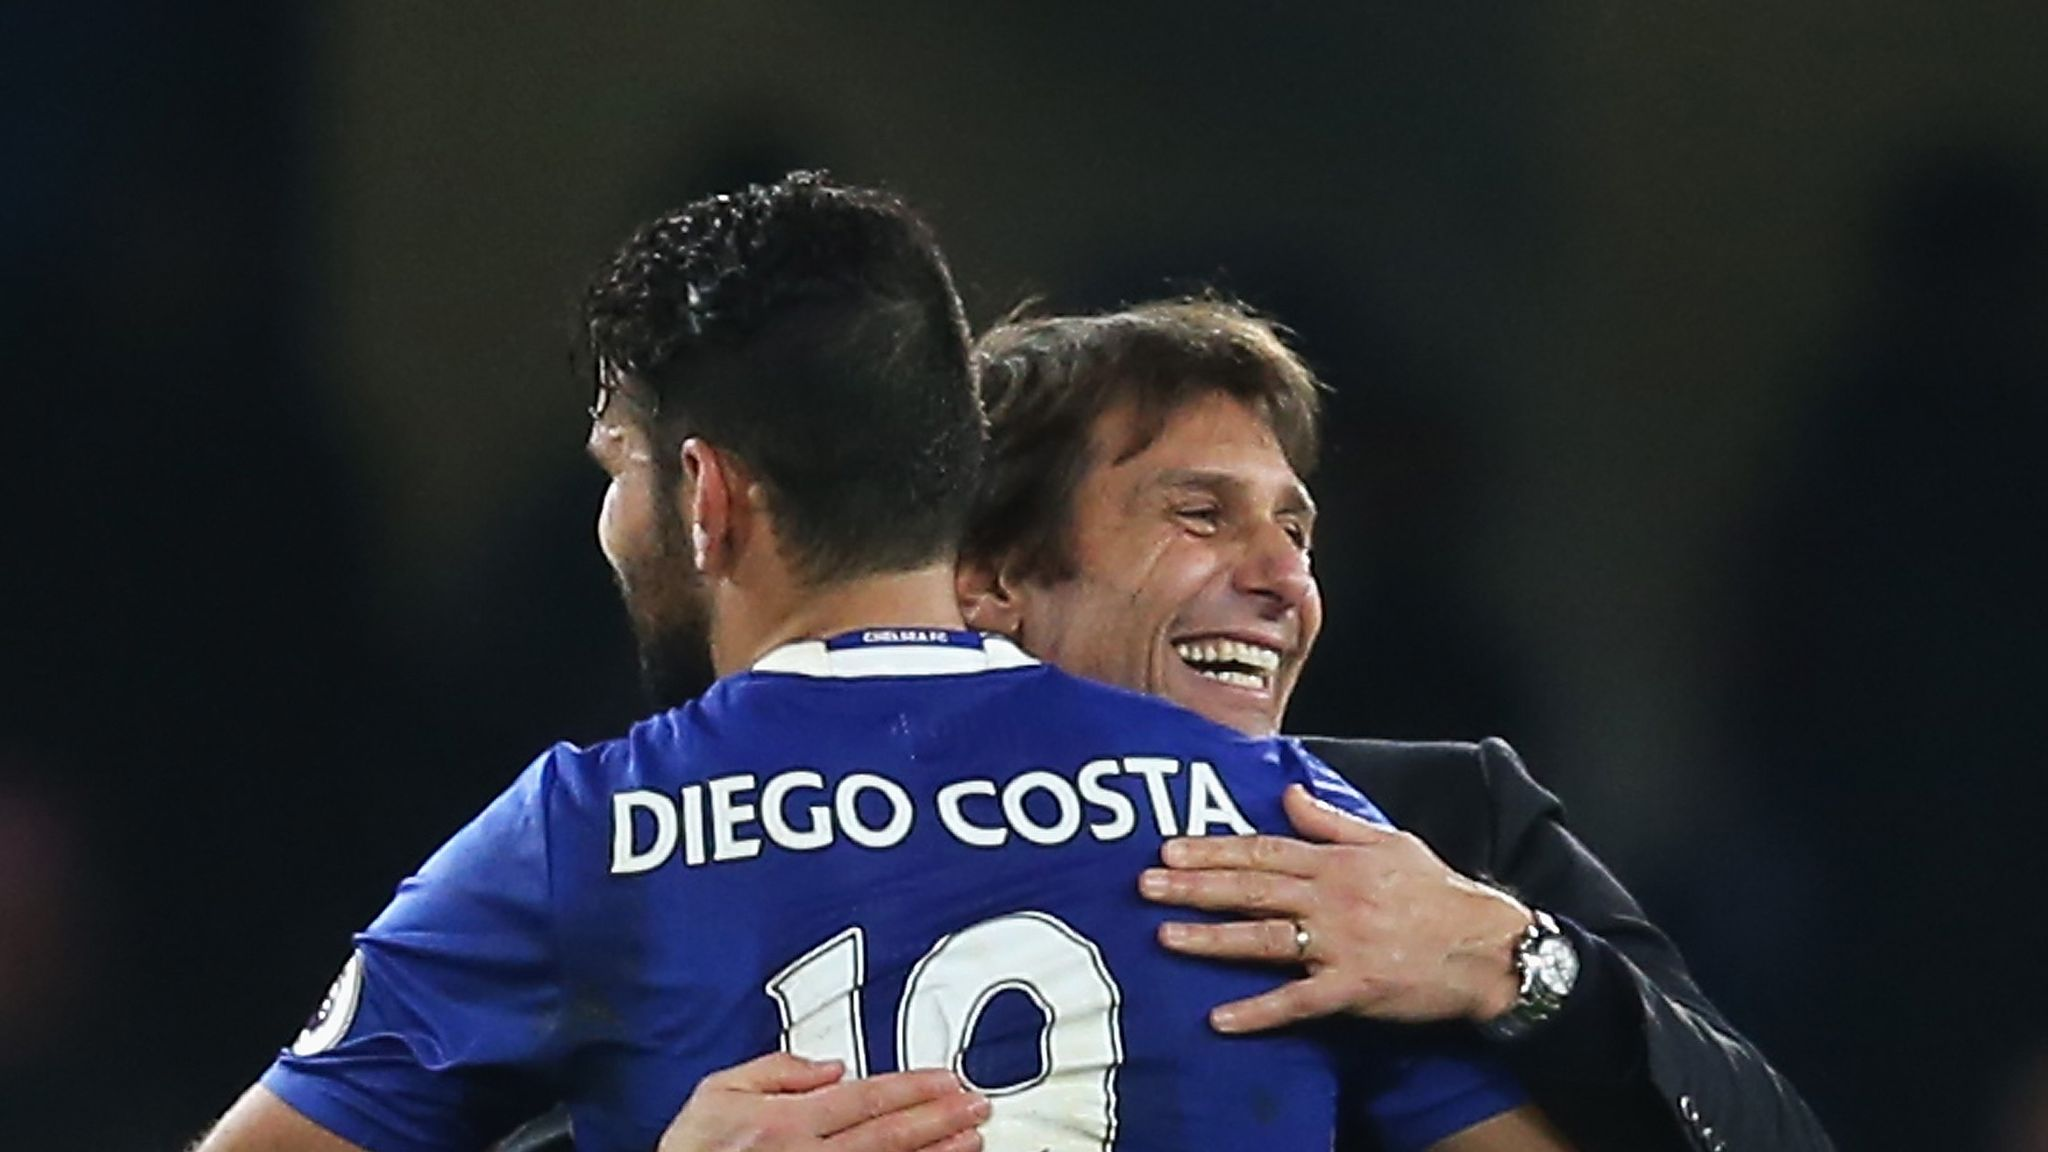 Conte won't last a season at Real Madrid – Costa